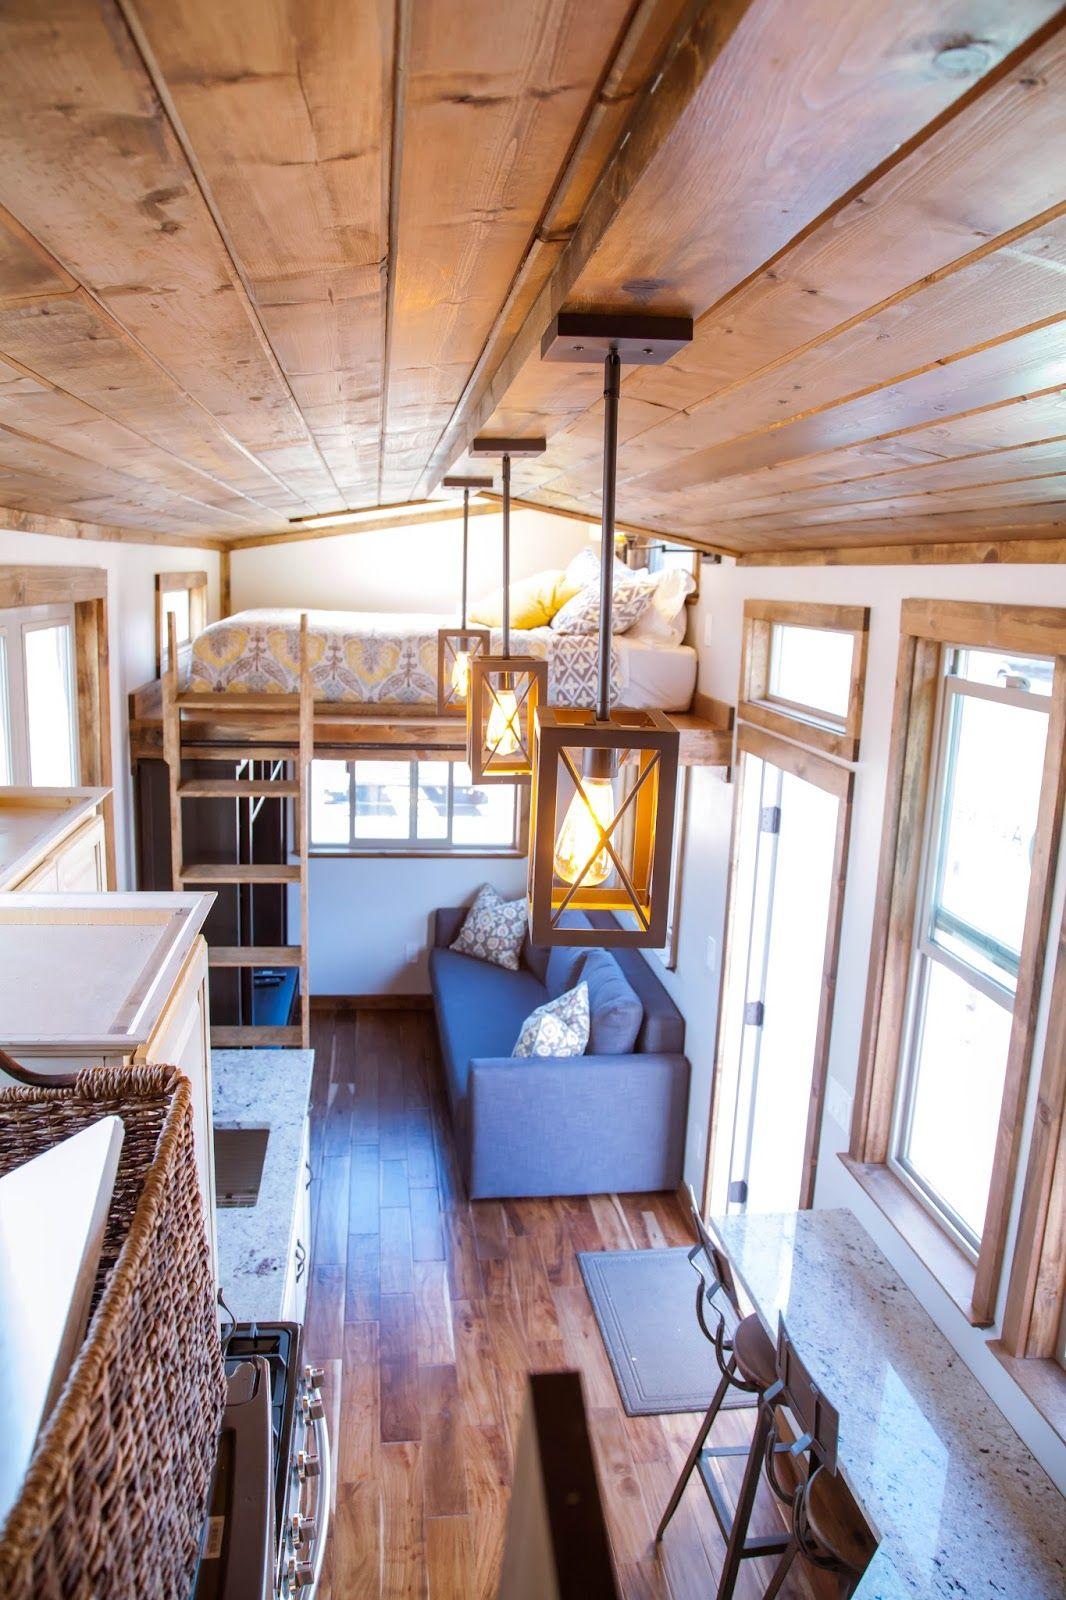 The Teton From Alpine Tiny Homes A Stunning Tiny House On